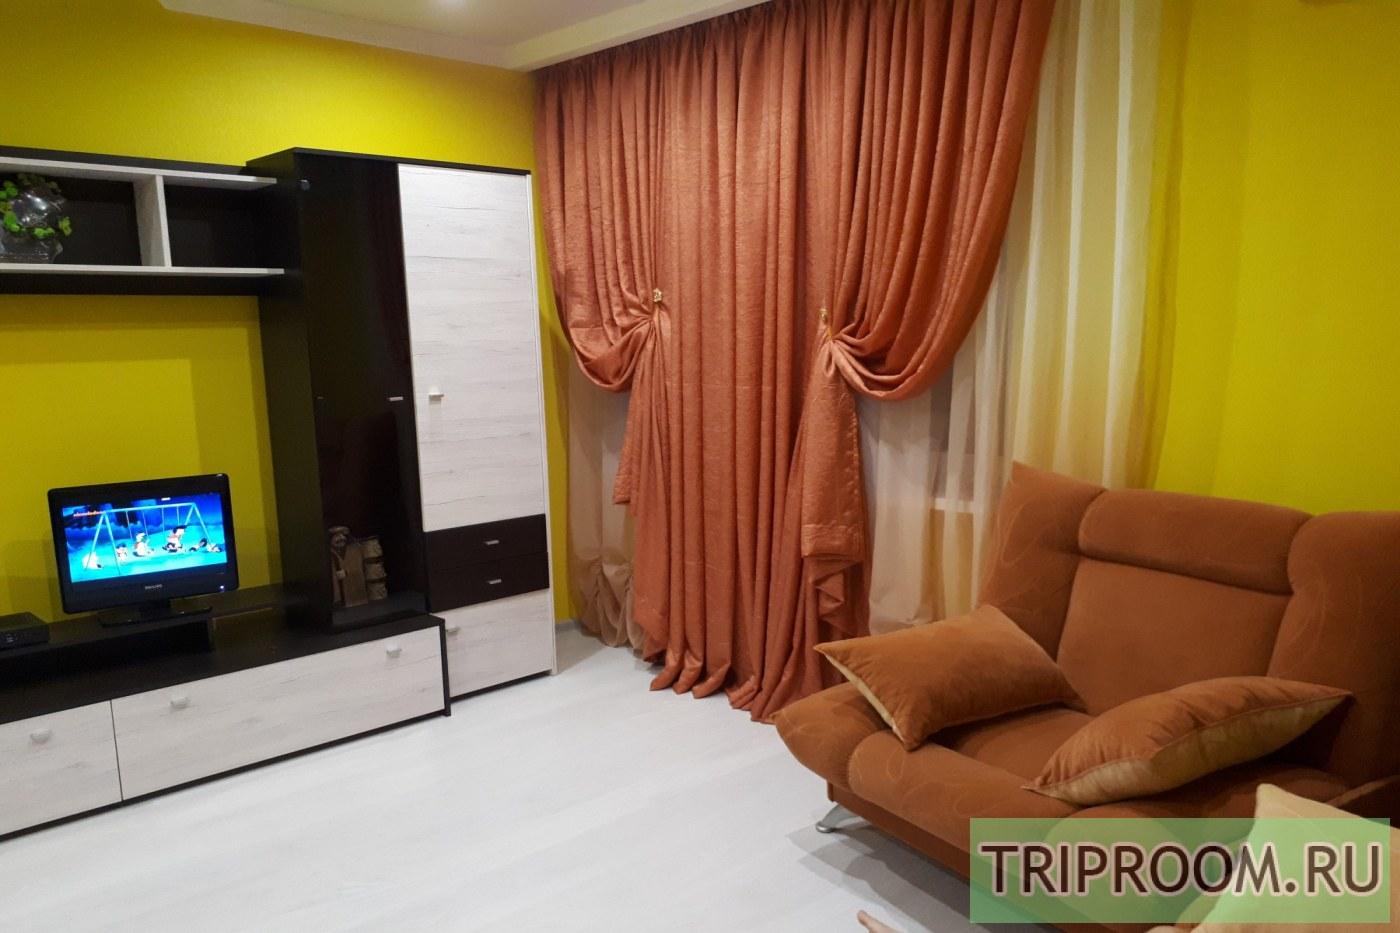 2-комнатная квартира посуточно (вариант № 39032), ул. Симиренко улица, фото № 1